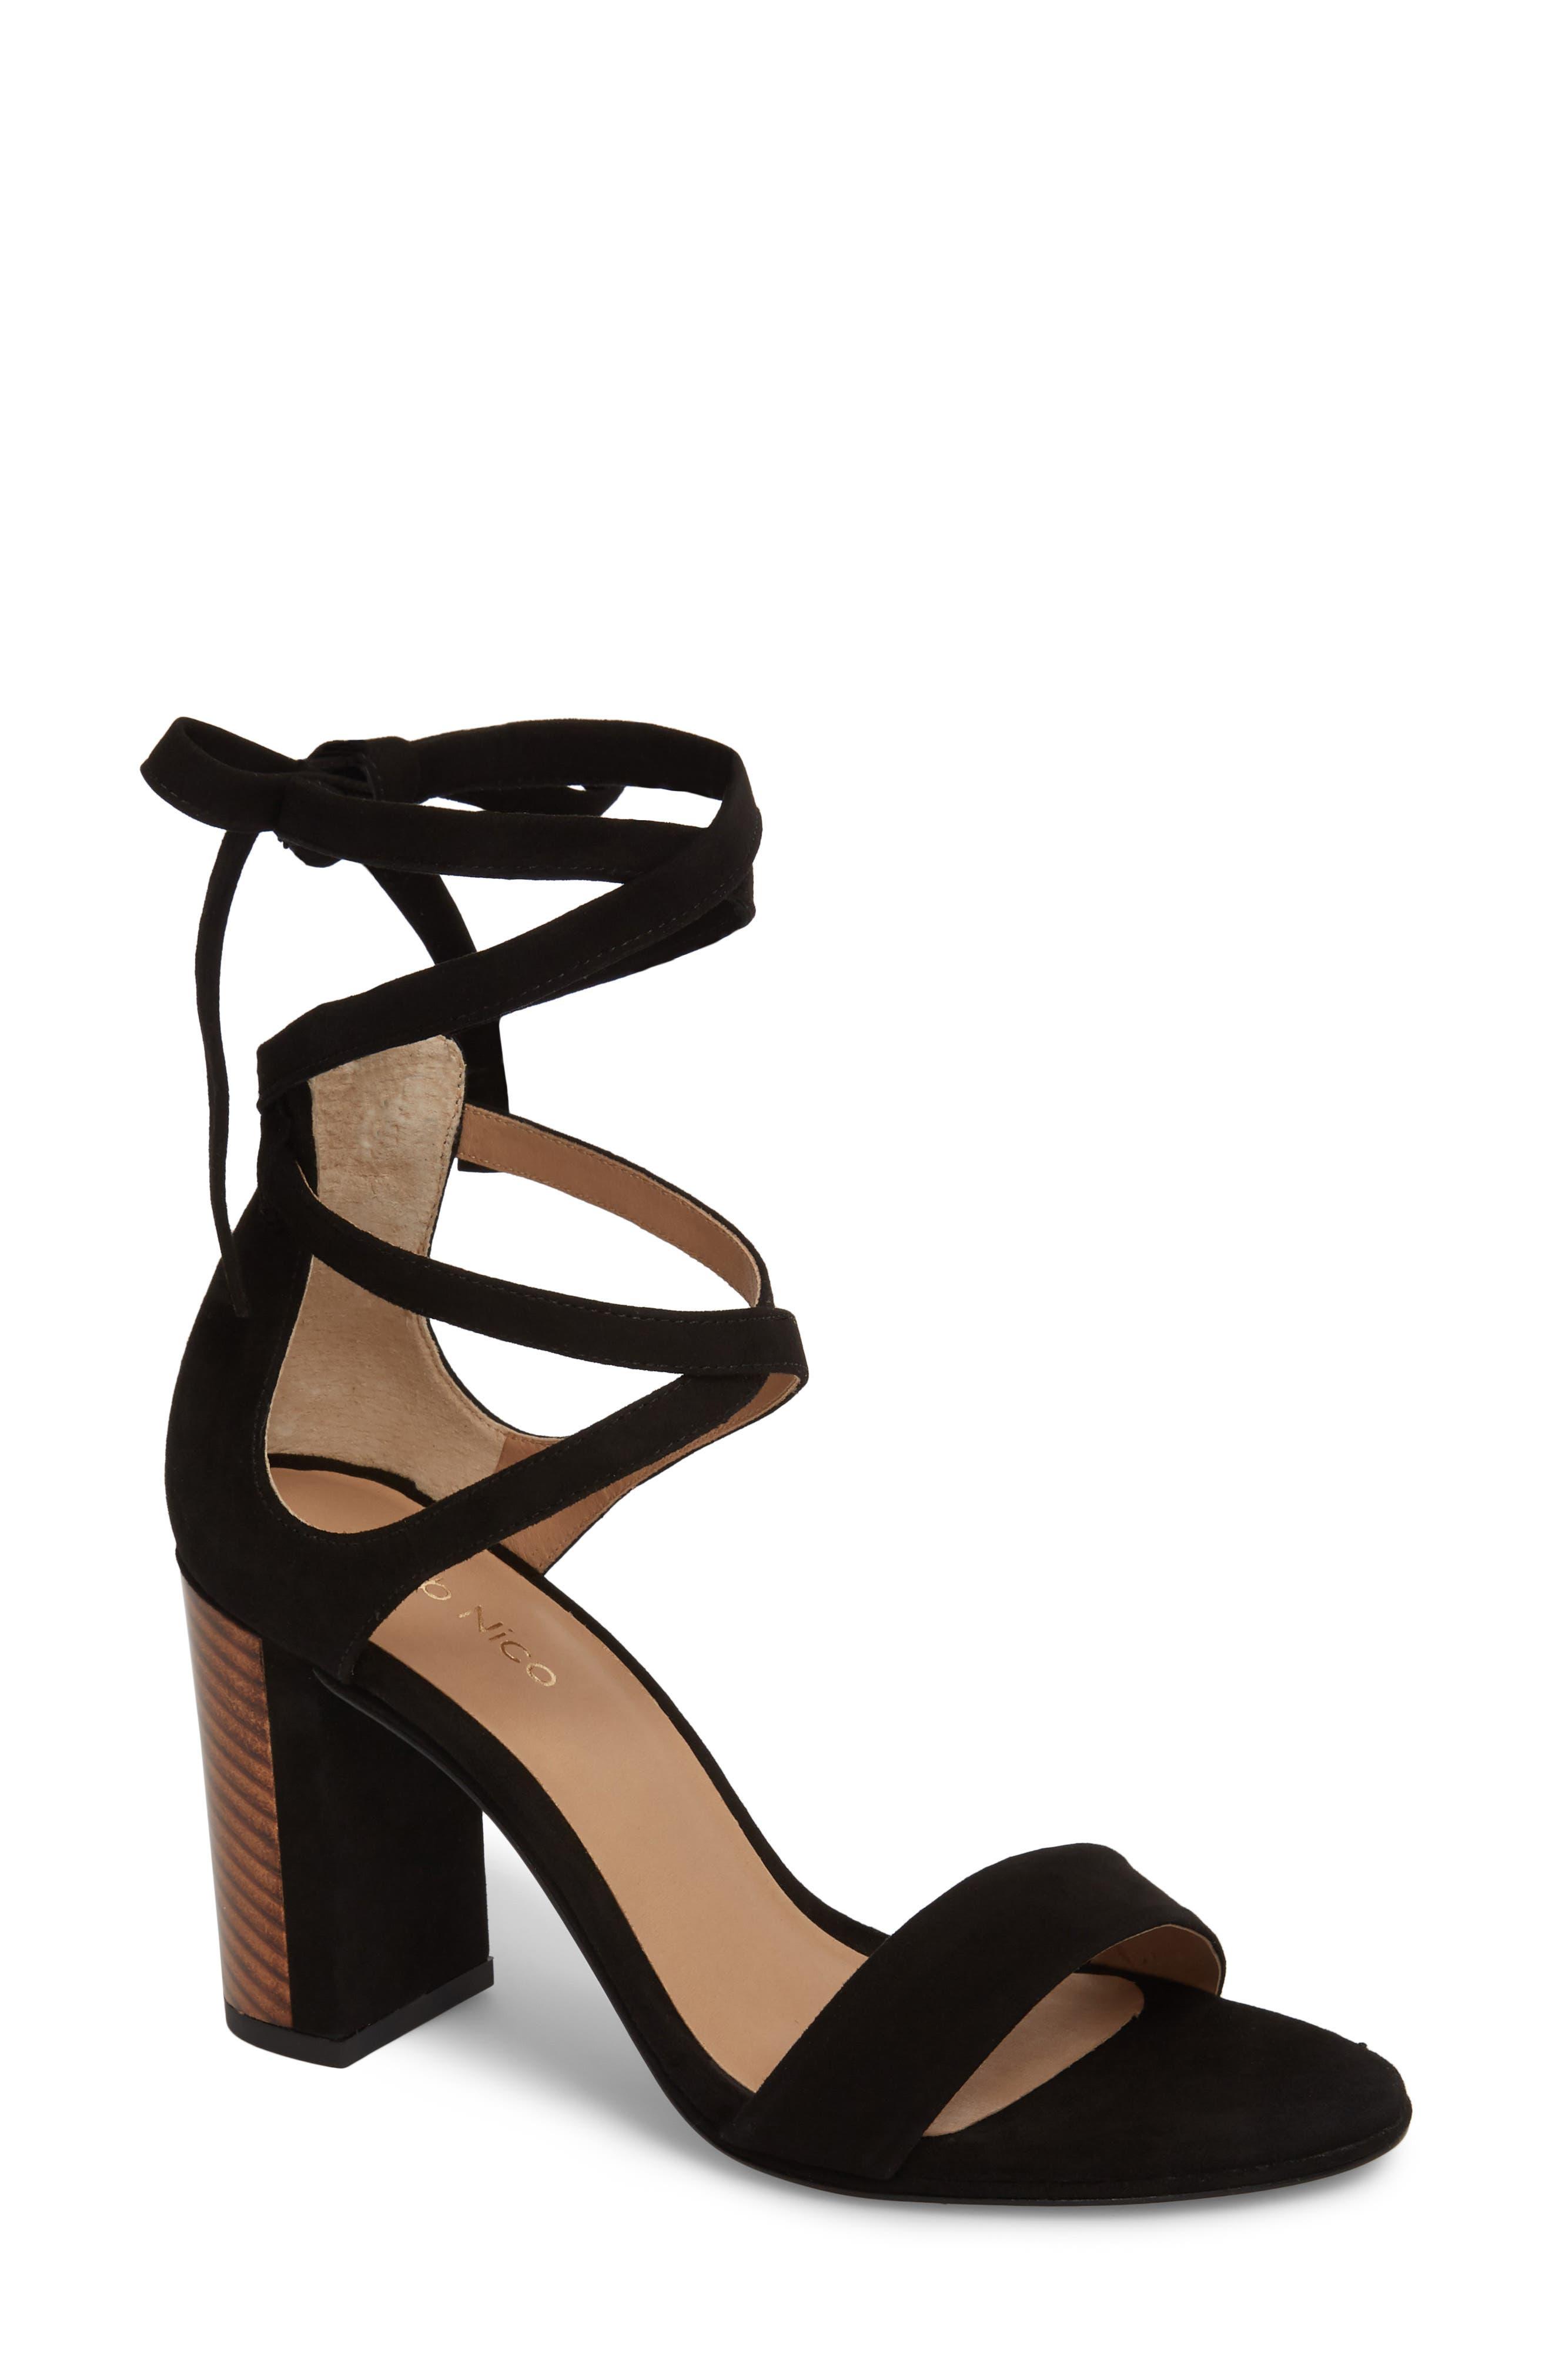 Tadeo Sandal,                         Main,                         color, Black Suede